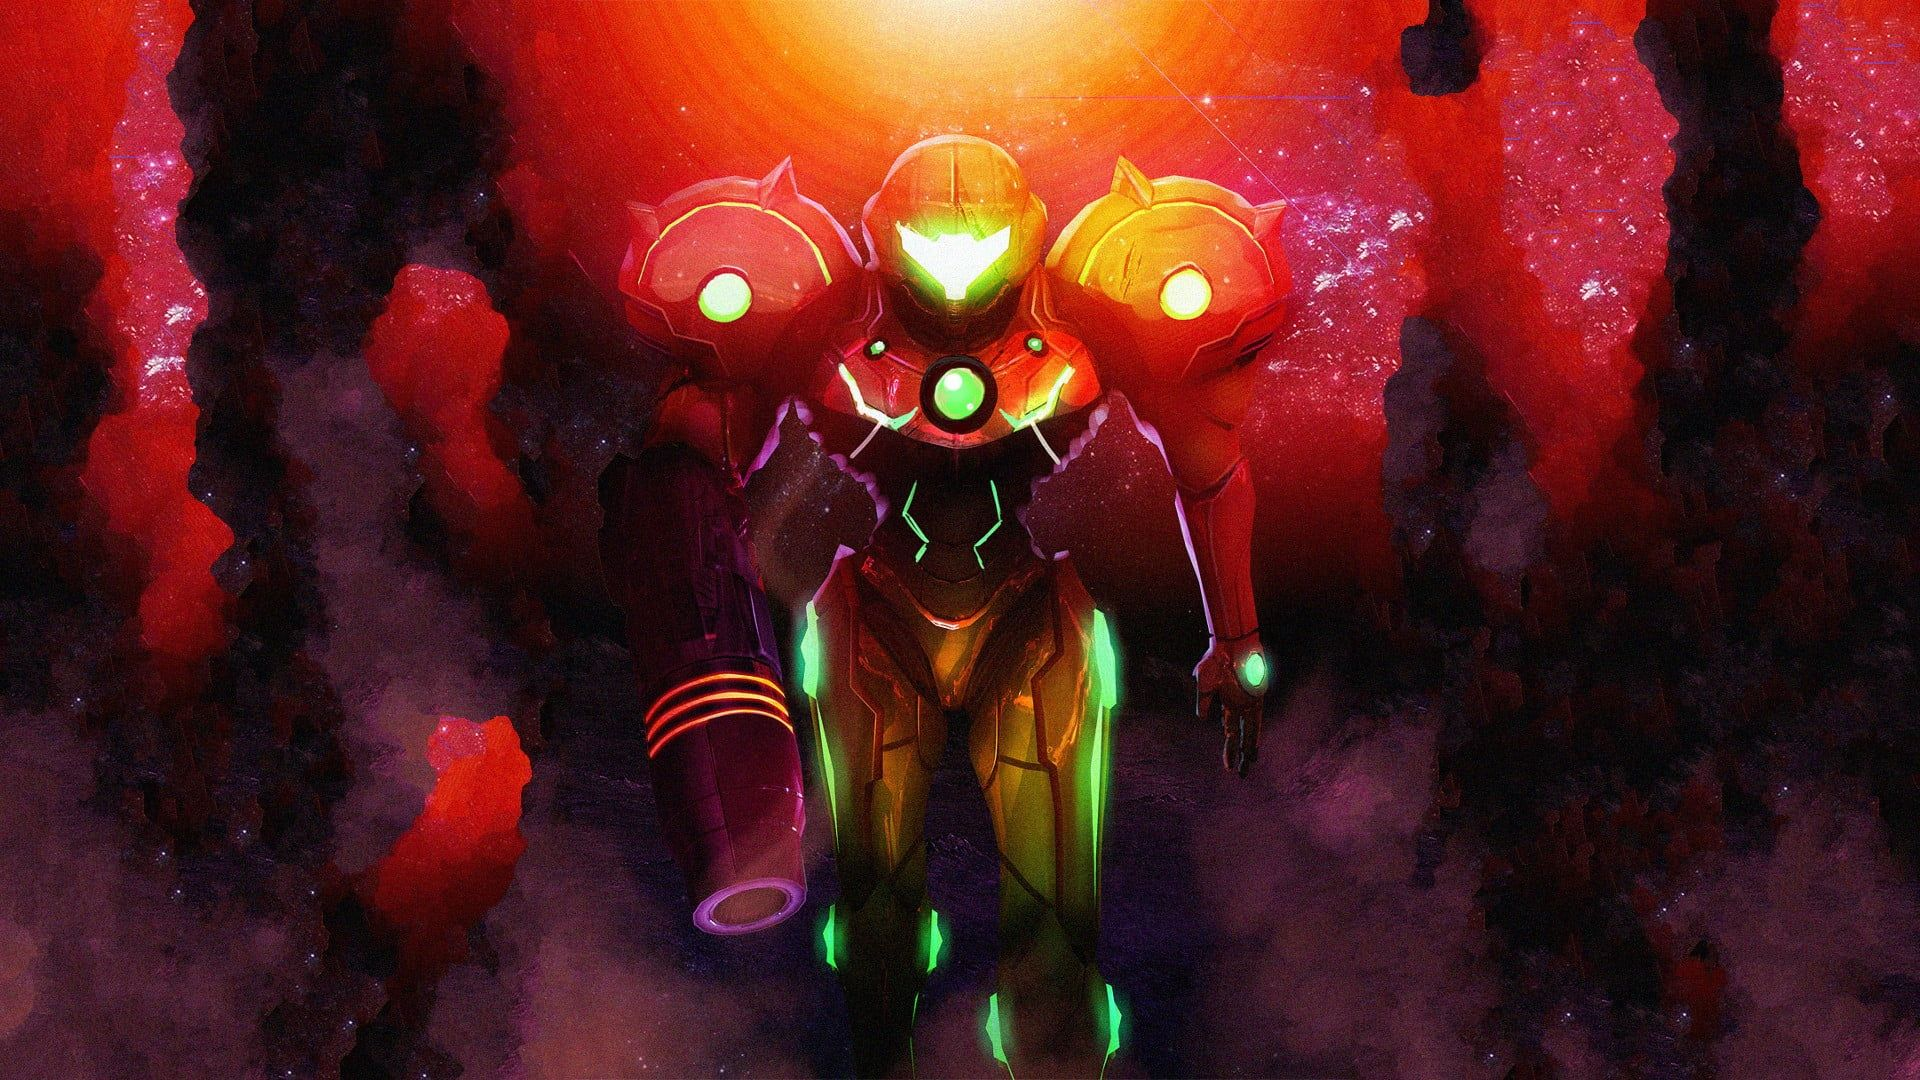 Red Robot Character Illustration Metroid Video Games Samus Aran 1080p Wallpaper Hdwallpaper Desktop Metroid Samus Aran Character Illustration